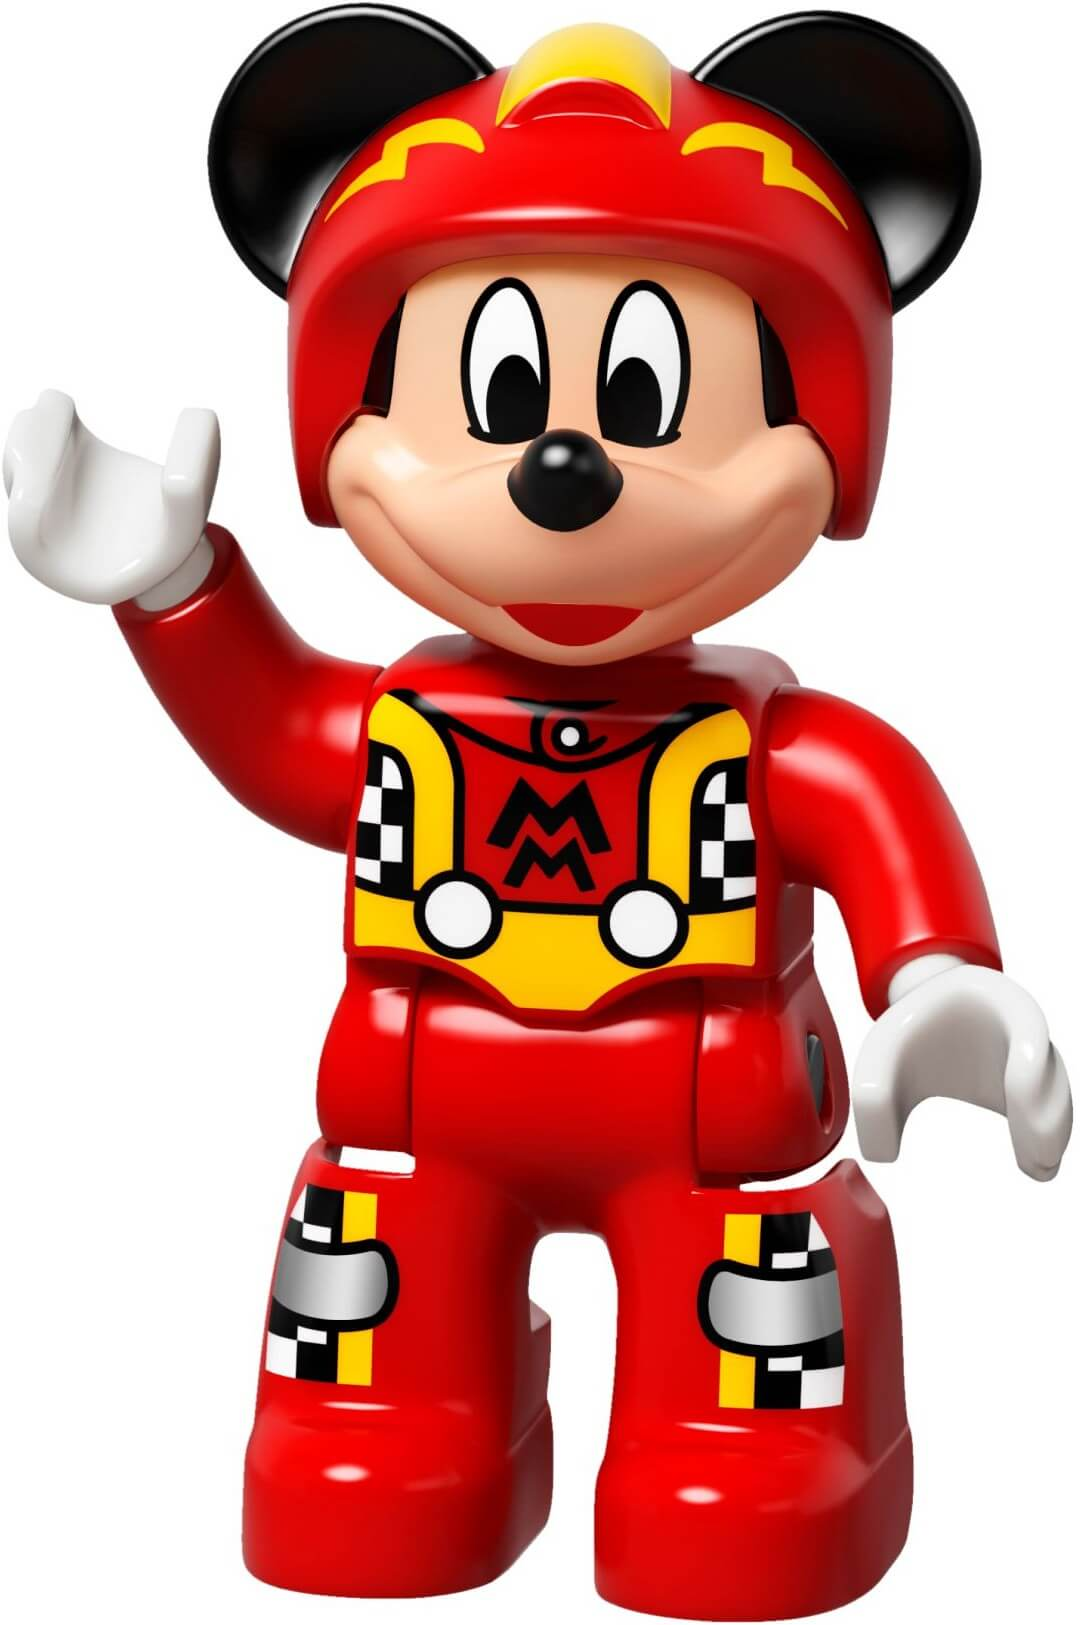 Mua đồ chơi LEGO 10843 - LEGO Duplo 10843 - Xe Đua của Chuột Mickey (LEGO Duplo Mickey Racer)